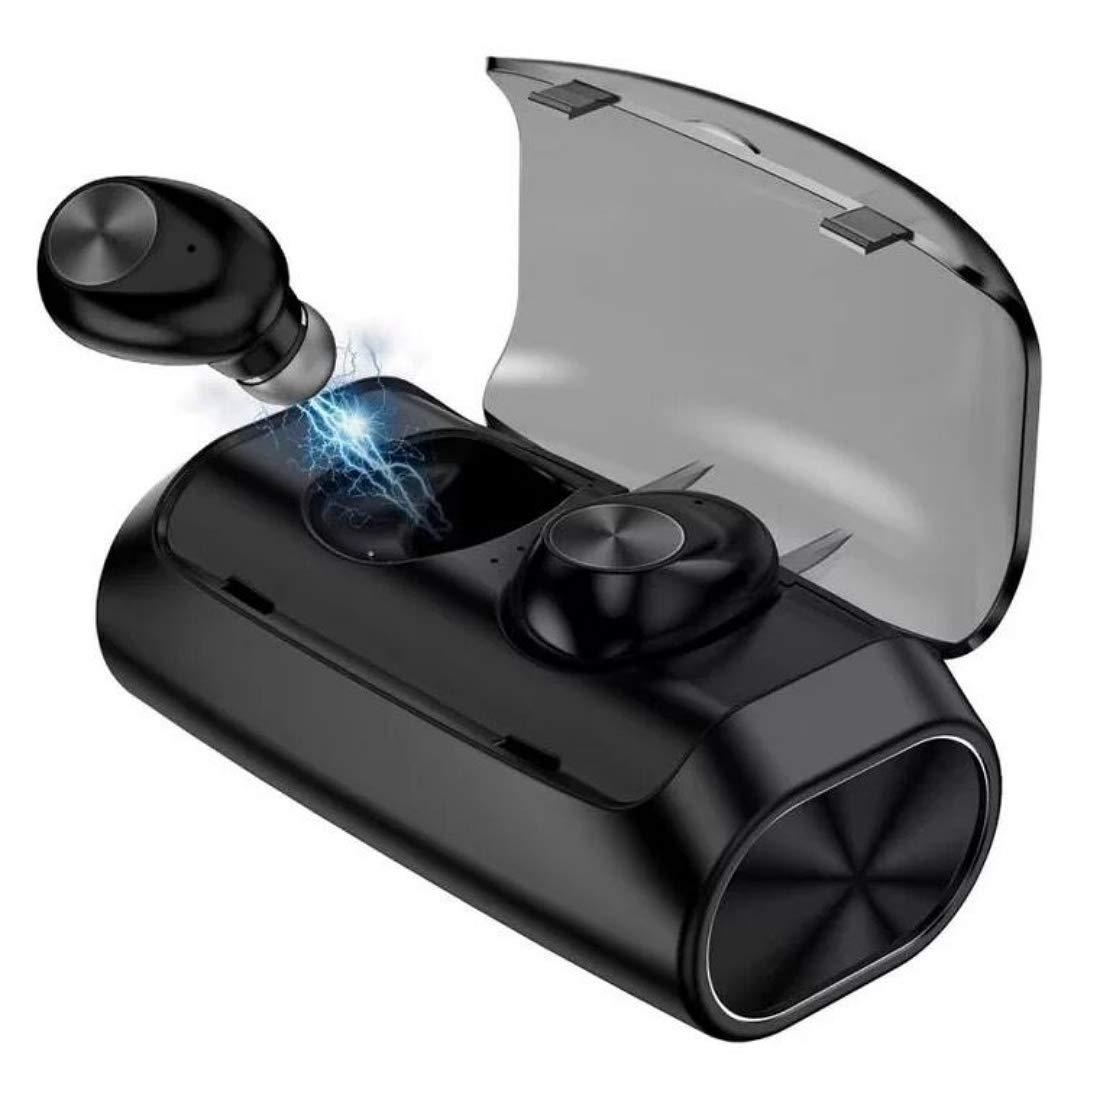 True Wireless Earbuds Bluetooth 5.0 Headphones | Sports in-Ear TWS Stereo Earphones Built-in Mini Headset | Deep Bass IPX5 Waterproof Instant Pairing 125H Battery Charging Case Earphones